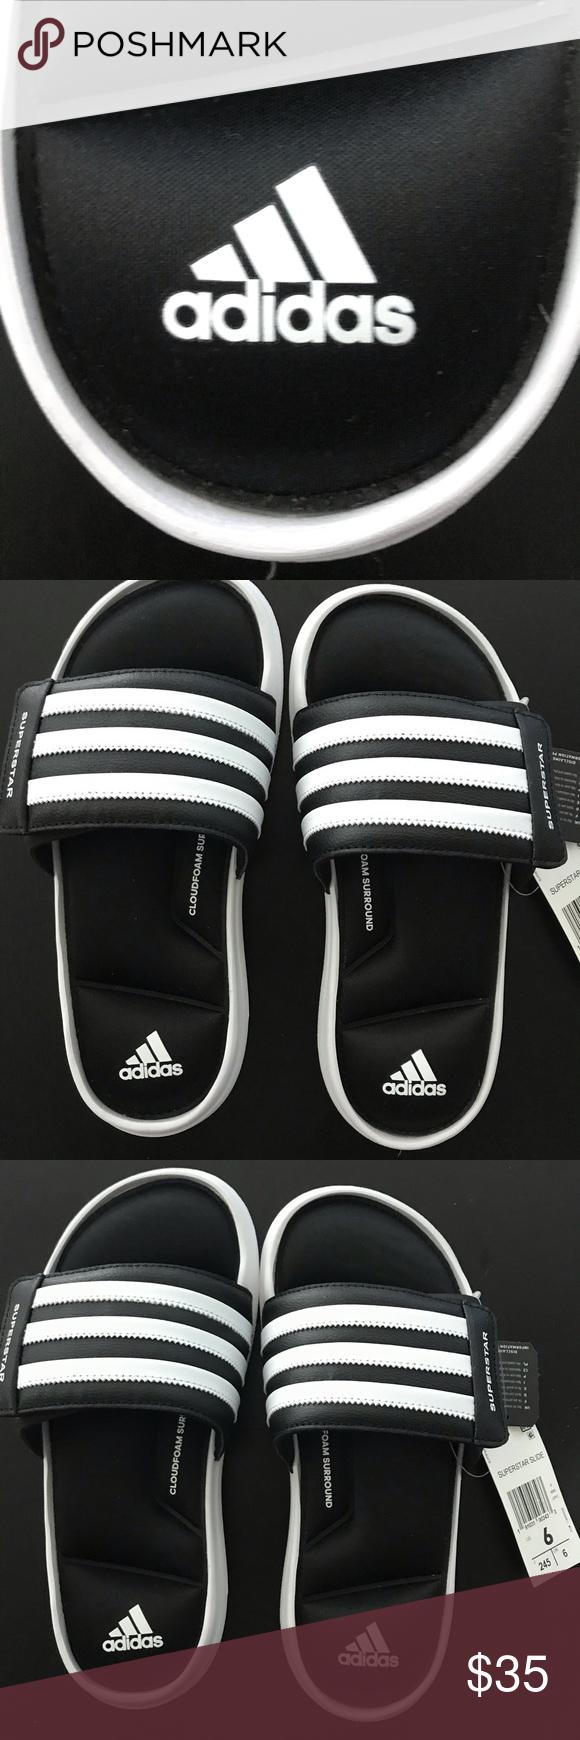 0369e96b1092 Adidas Performance Superstar Slides Black Fitfoam Adidas Performance Men s  Superstar Slides white (Size 6 US